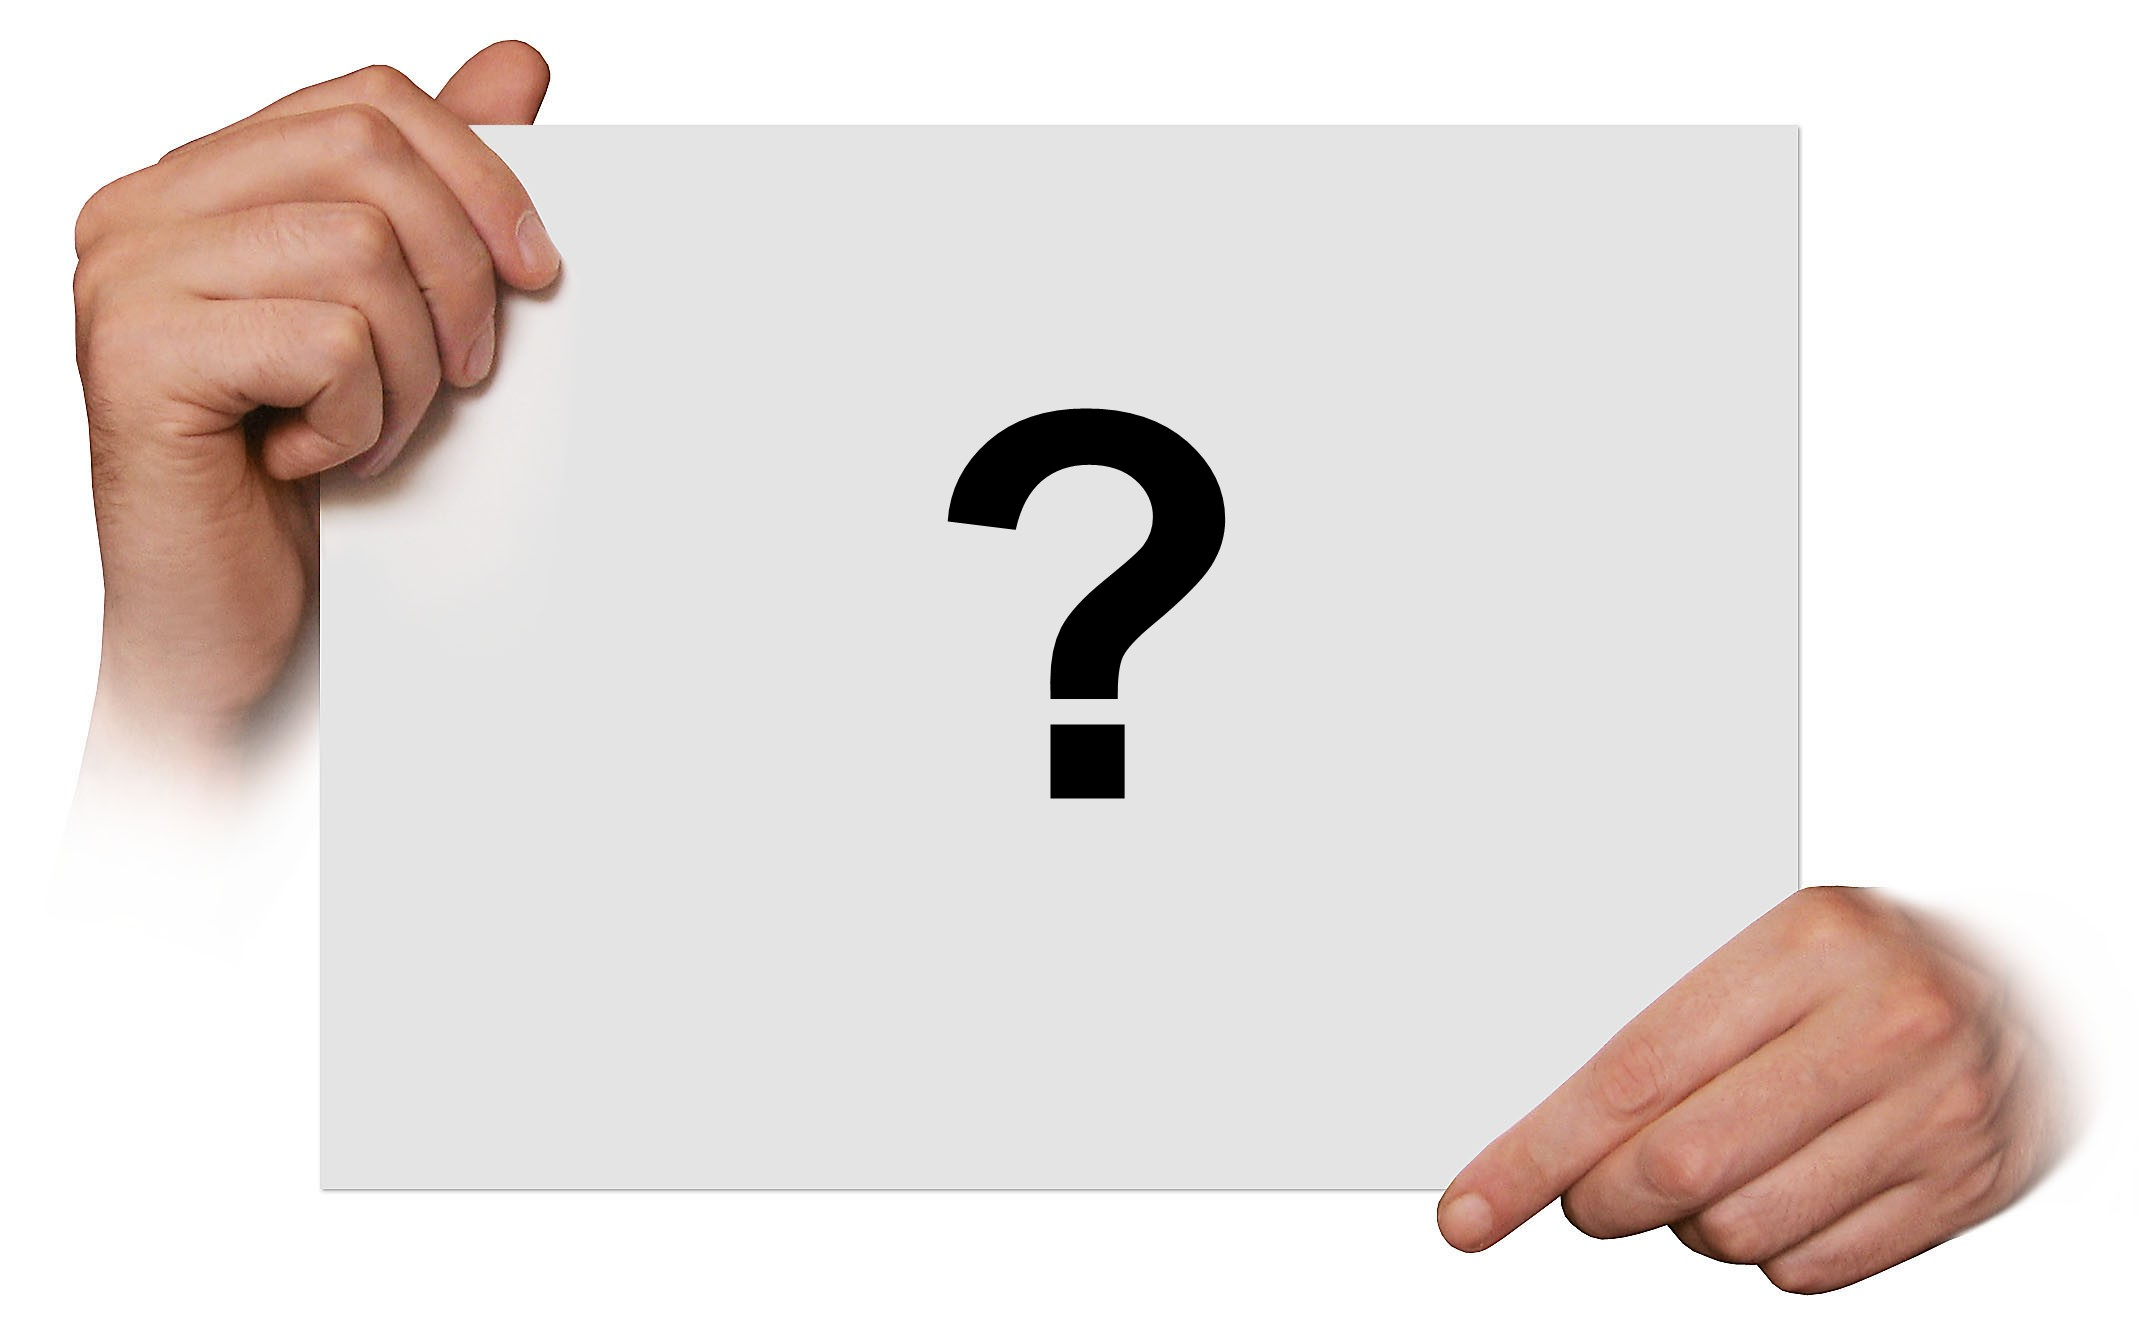 blank-sign-question.jpg